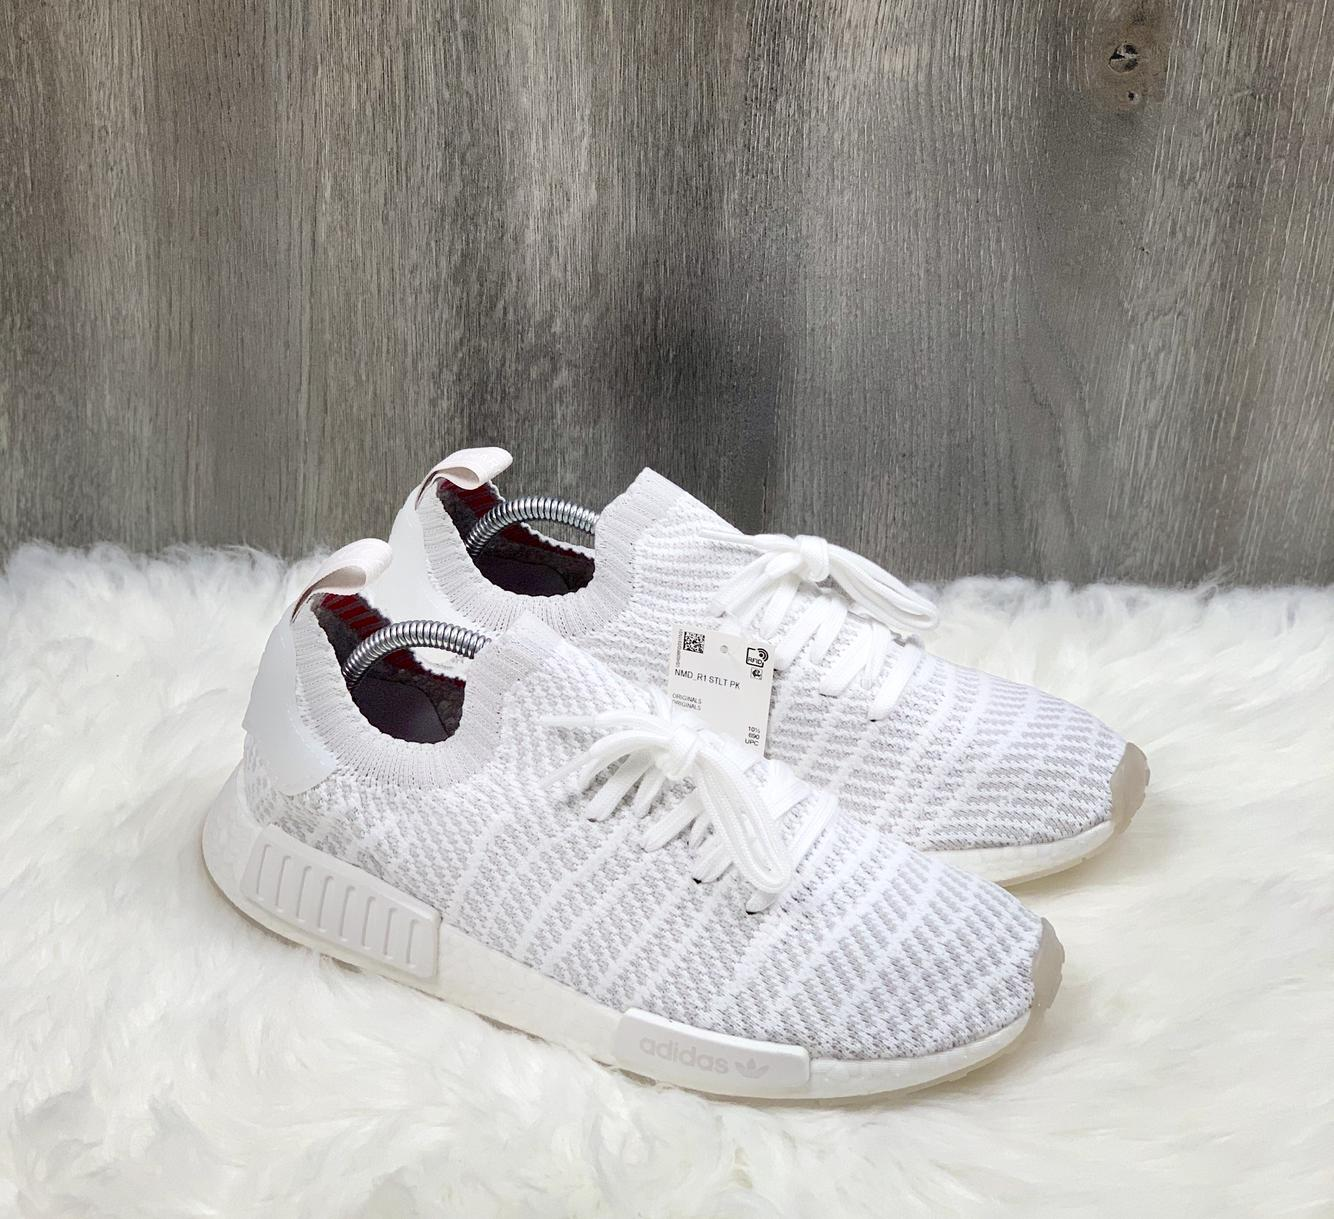 Adidas NMD_R1 STLT Primeknit Cloud White Running Shoes CQ2390 ...